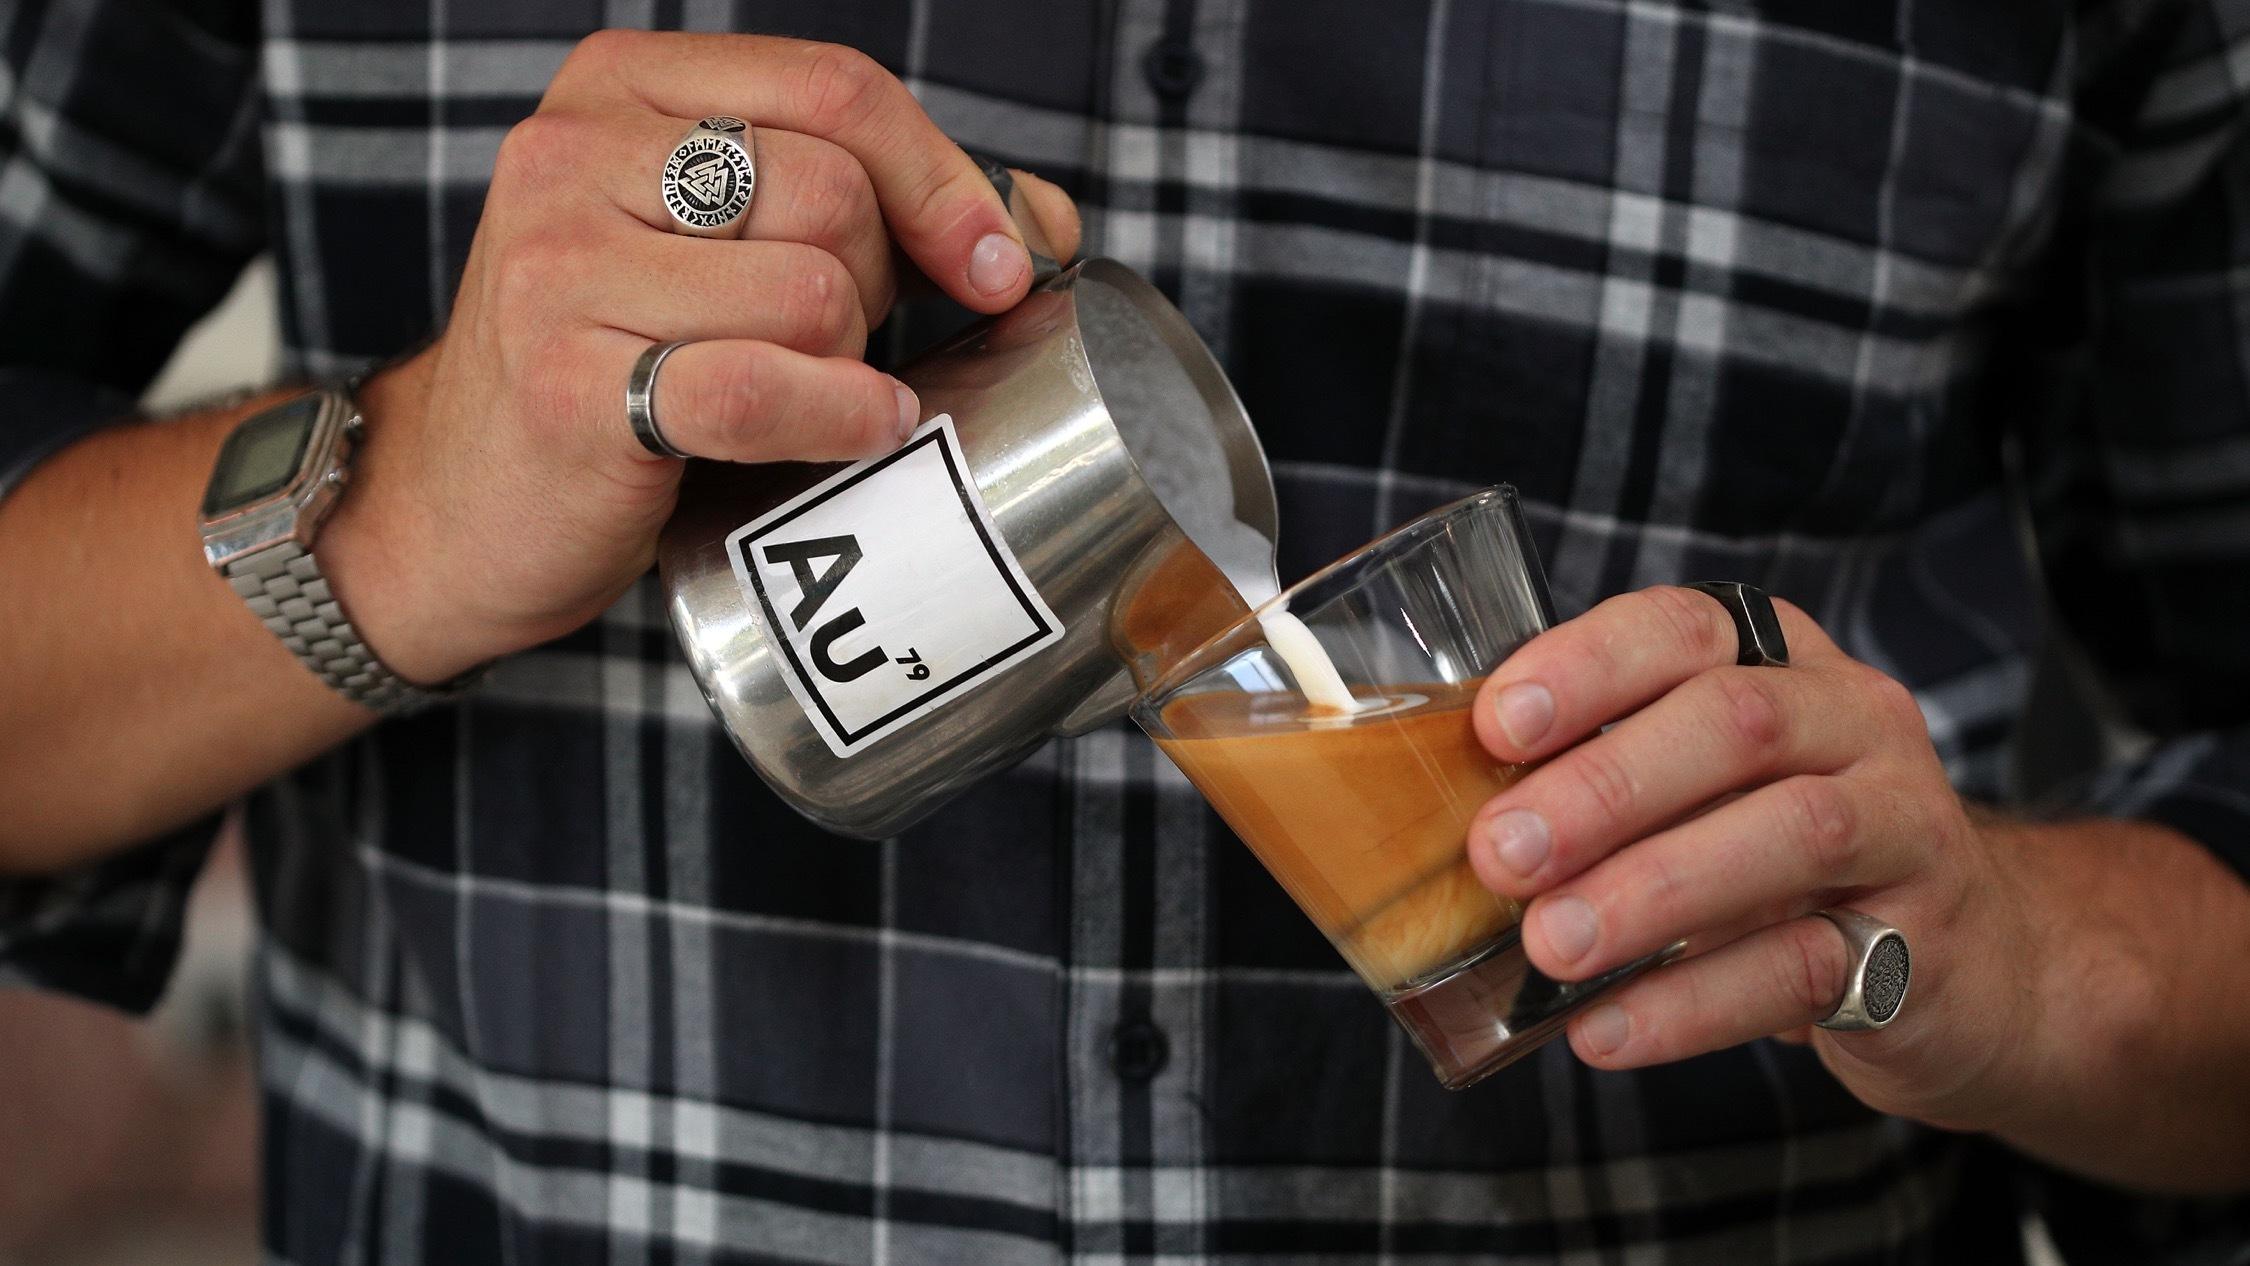 Coffee pour at AU79